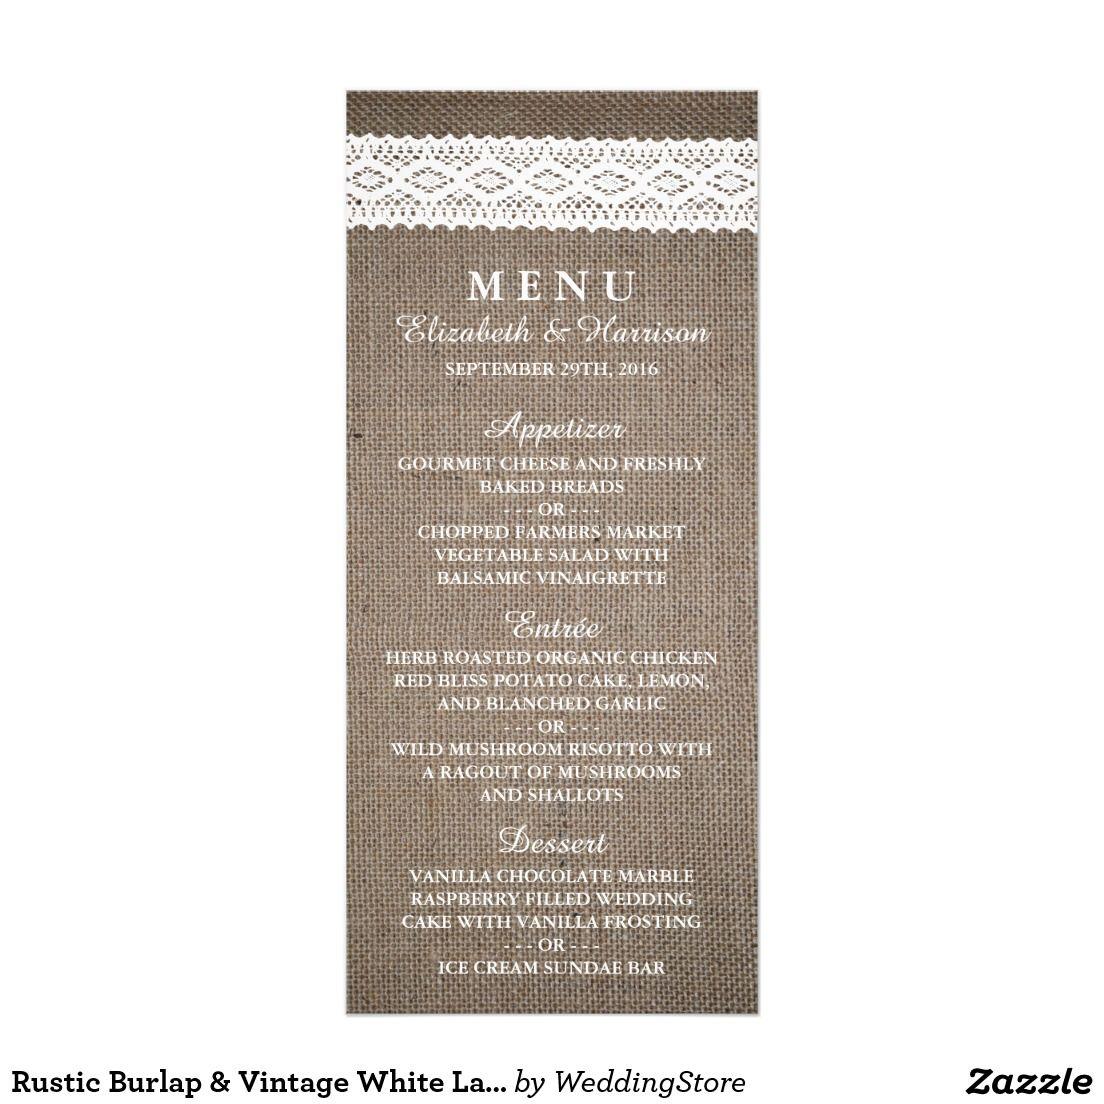 Rustic Burlap & Vintage White Lace Wedding Menu | WEDDING INVITATION ...